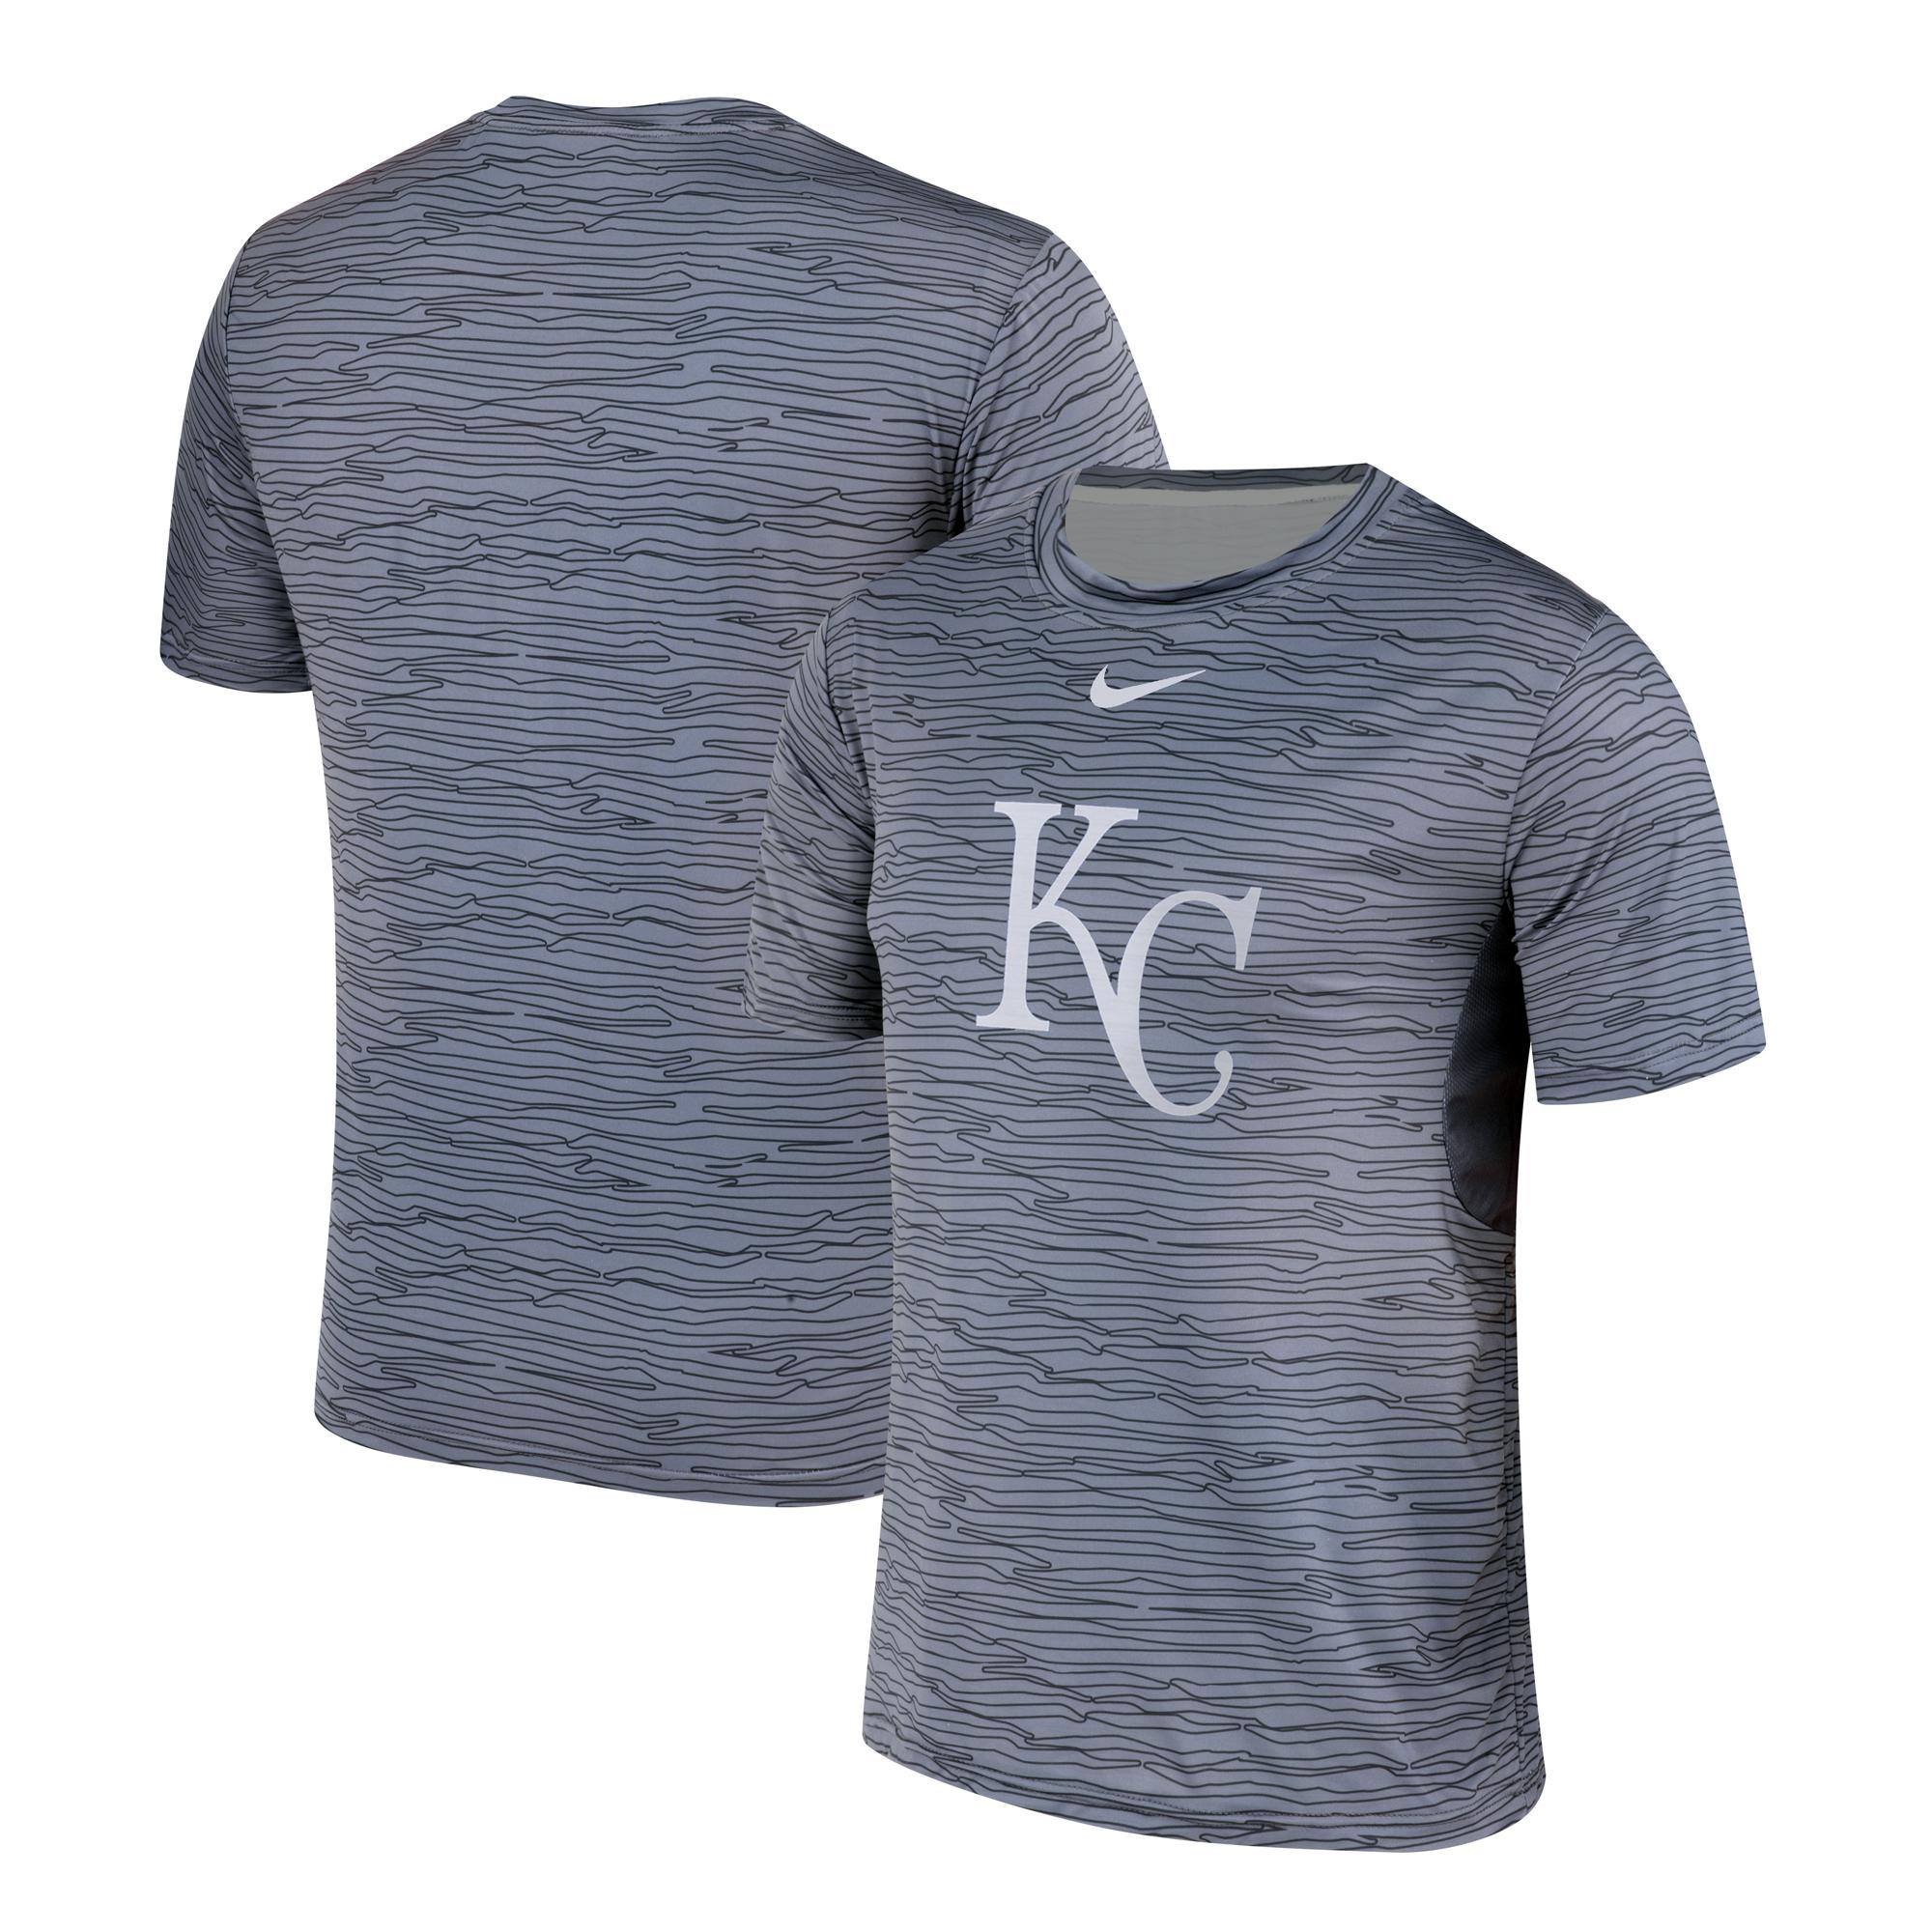 Nike Kansas City Gray Black Striped Logo Performance T-Shirt